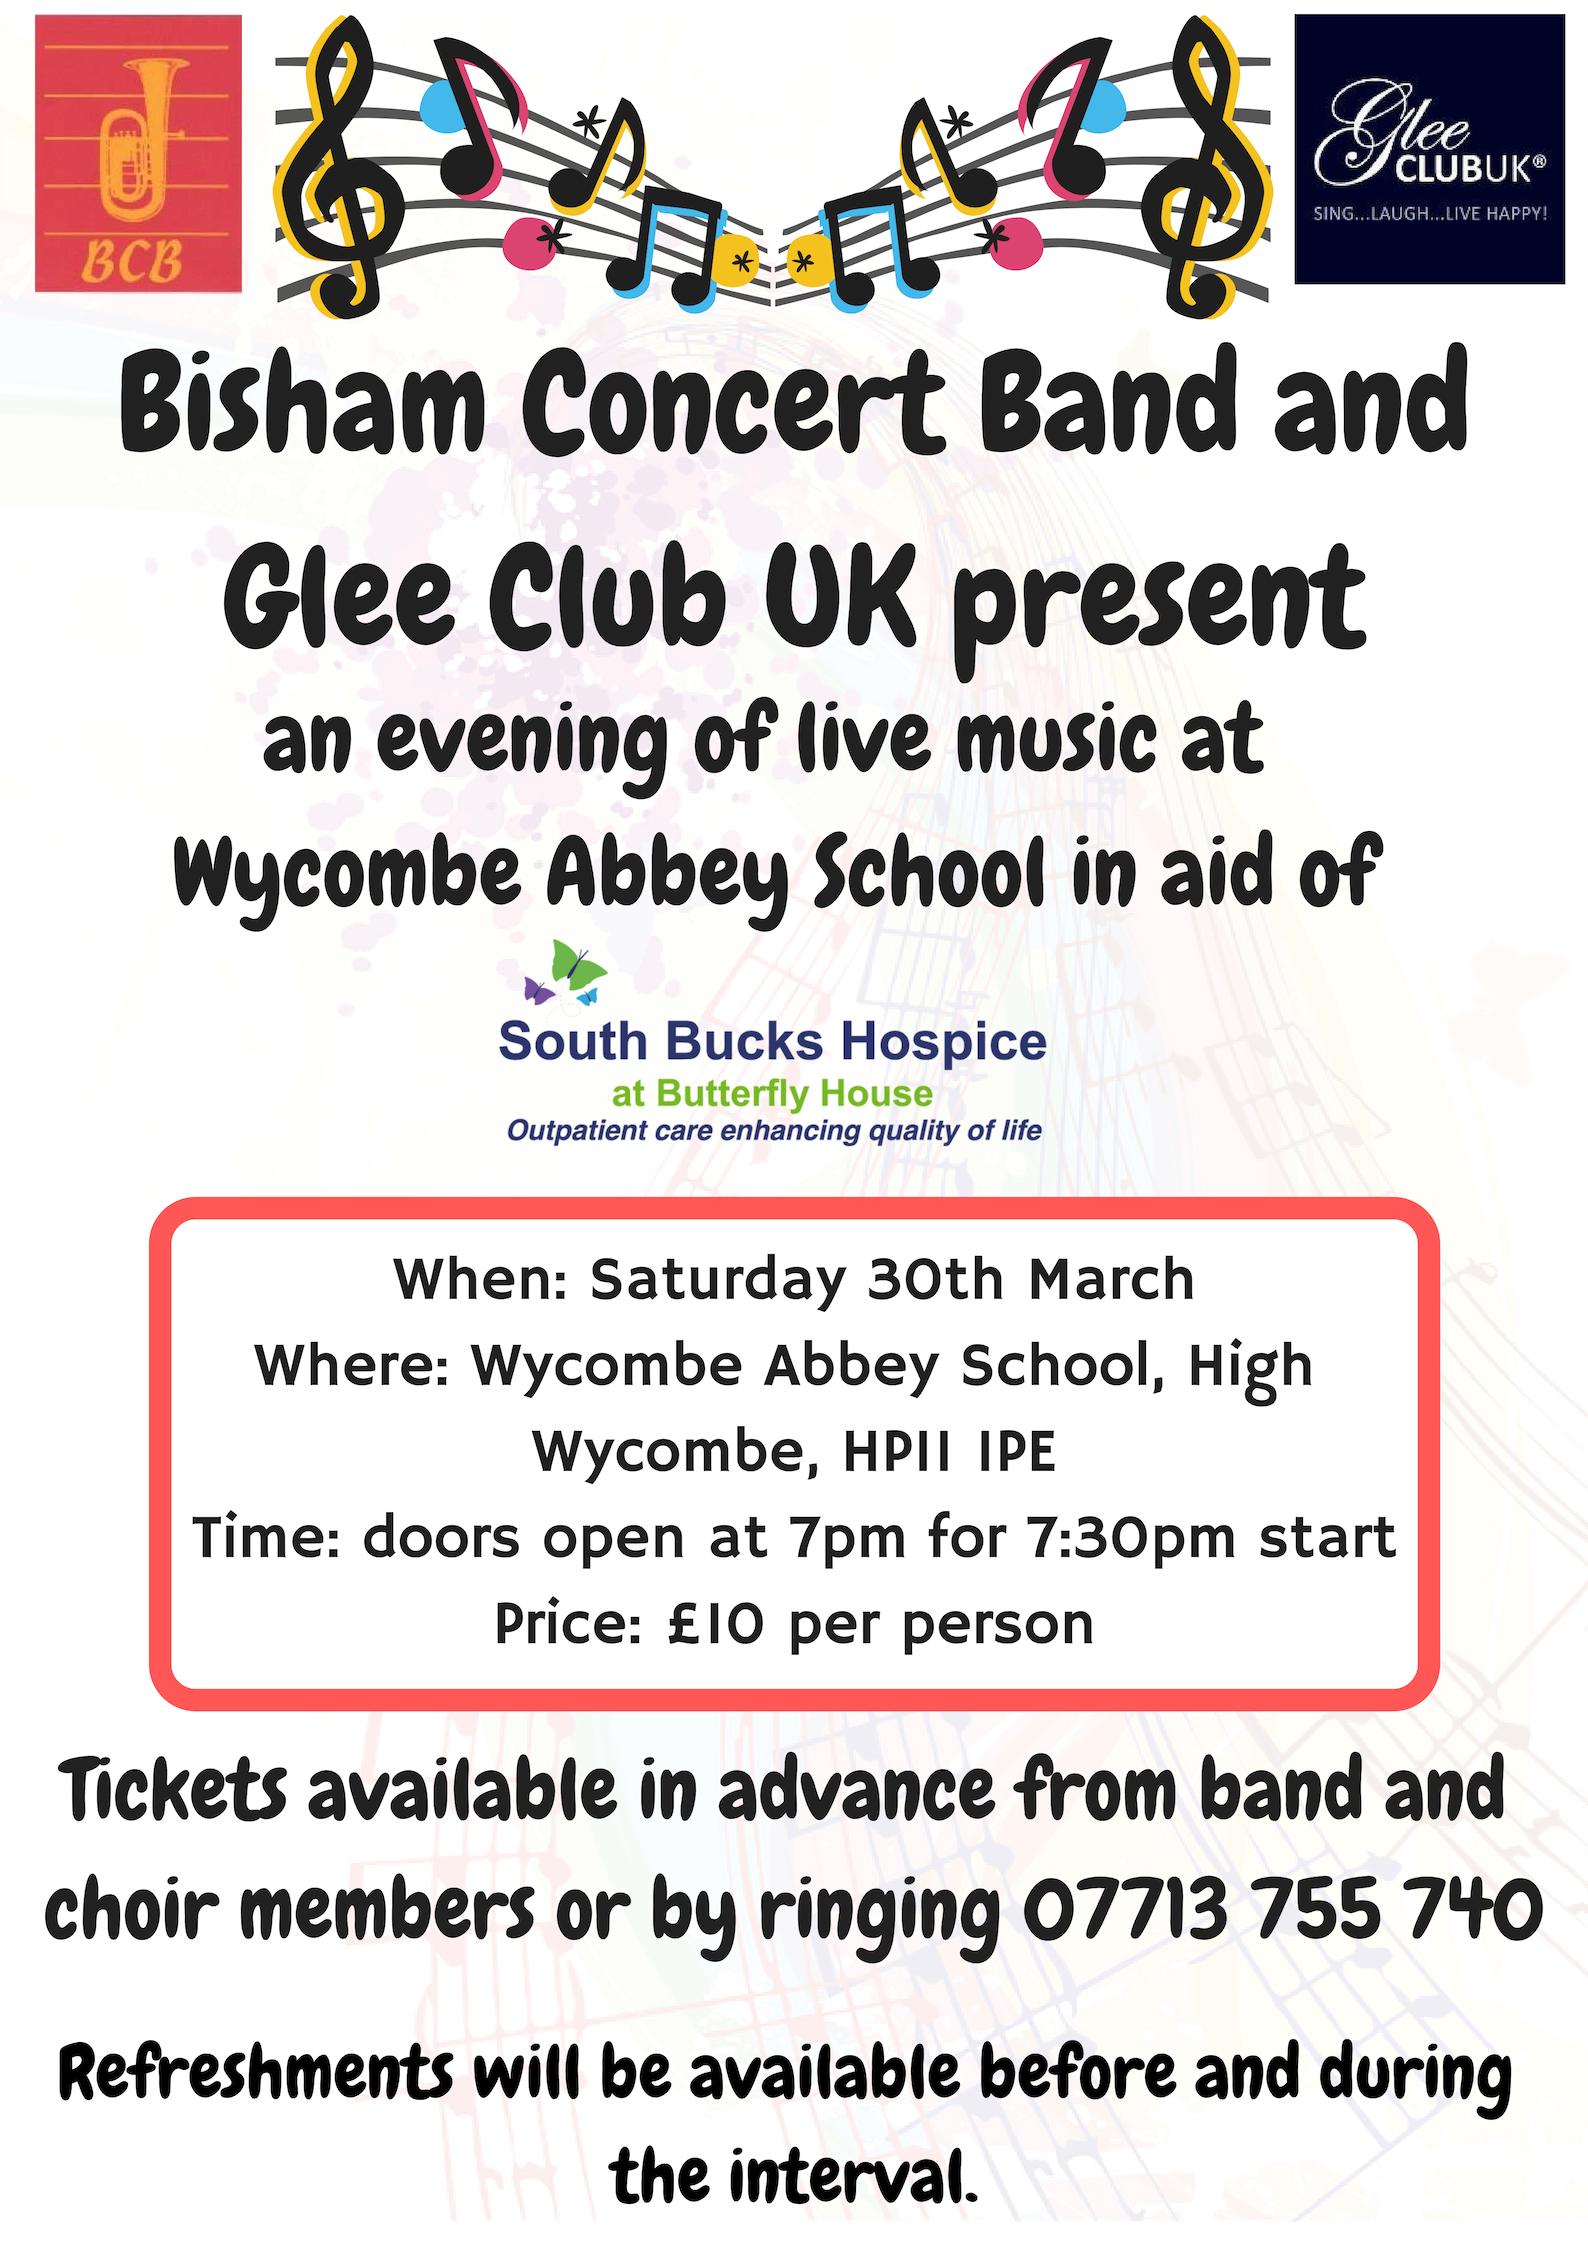 Copy Of Bisham Concert Band And Glee Club Uk Present 1